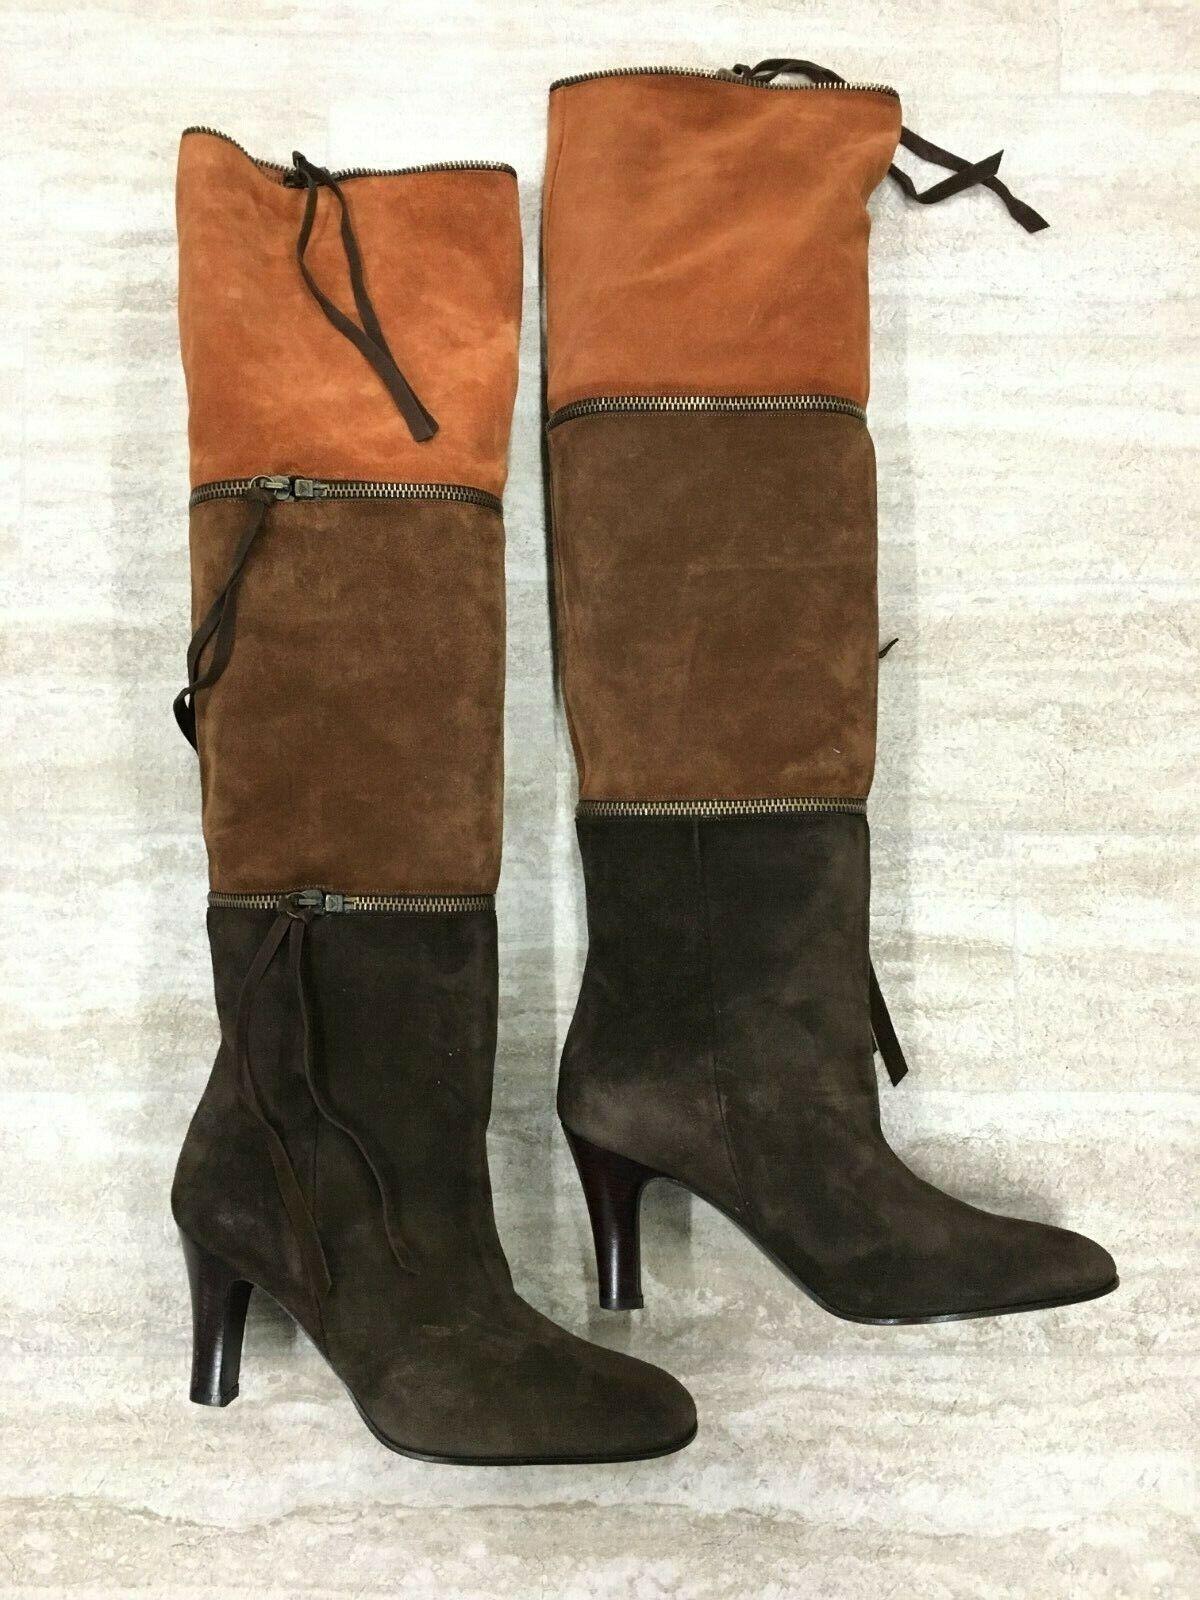 BCBGMAXAZRIA Knee High Suede Leather 3 in 1 Zipper braun Combo Heel Stiefel SZ 9 B